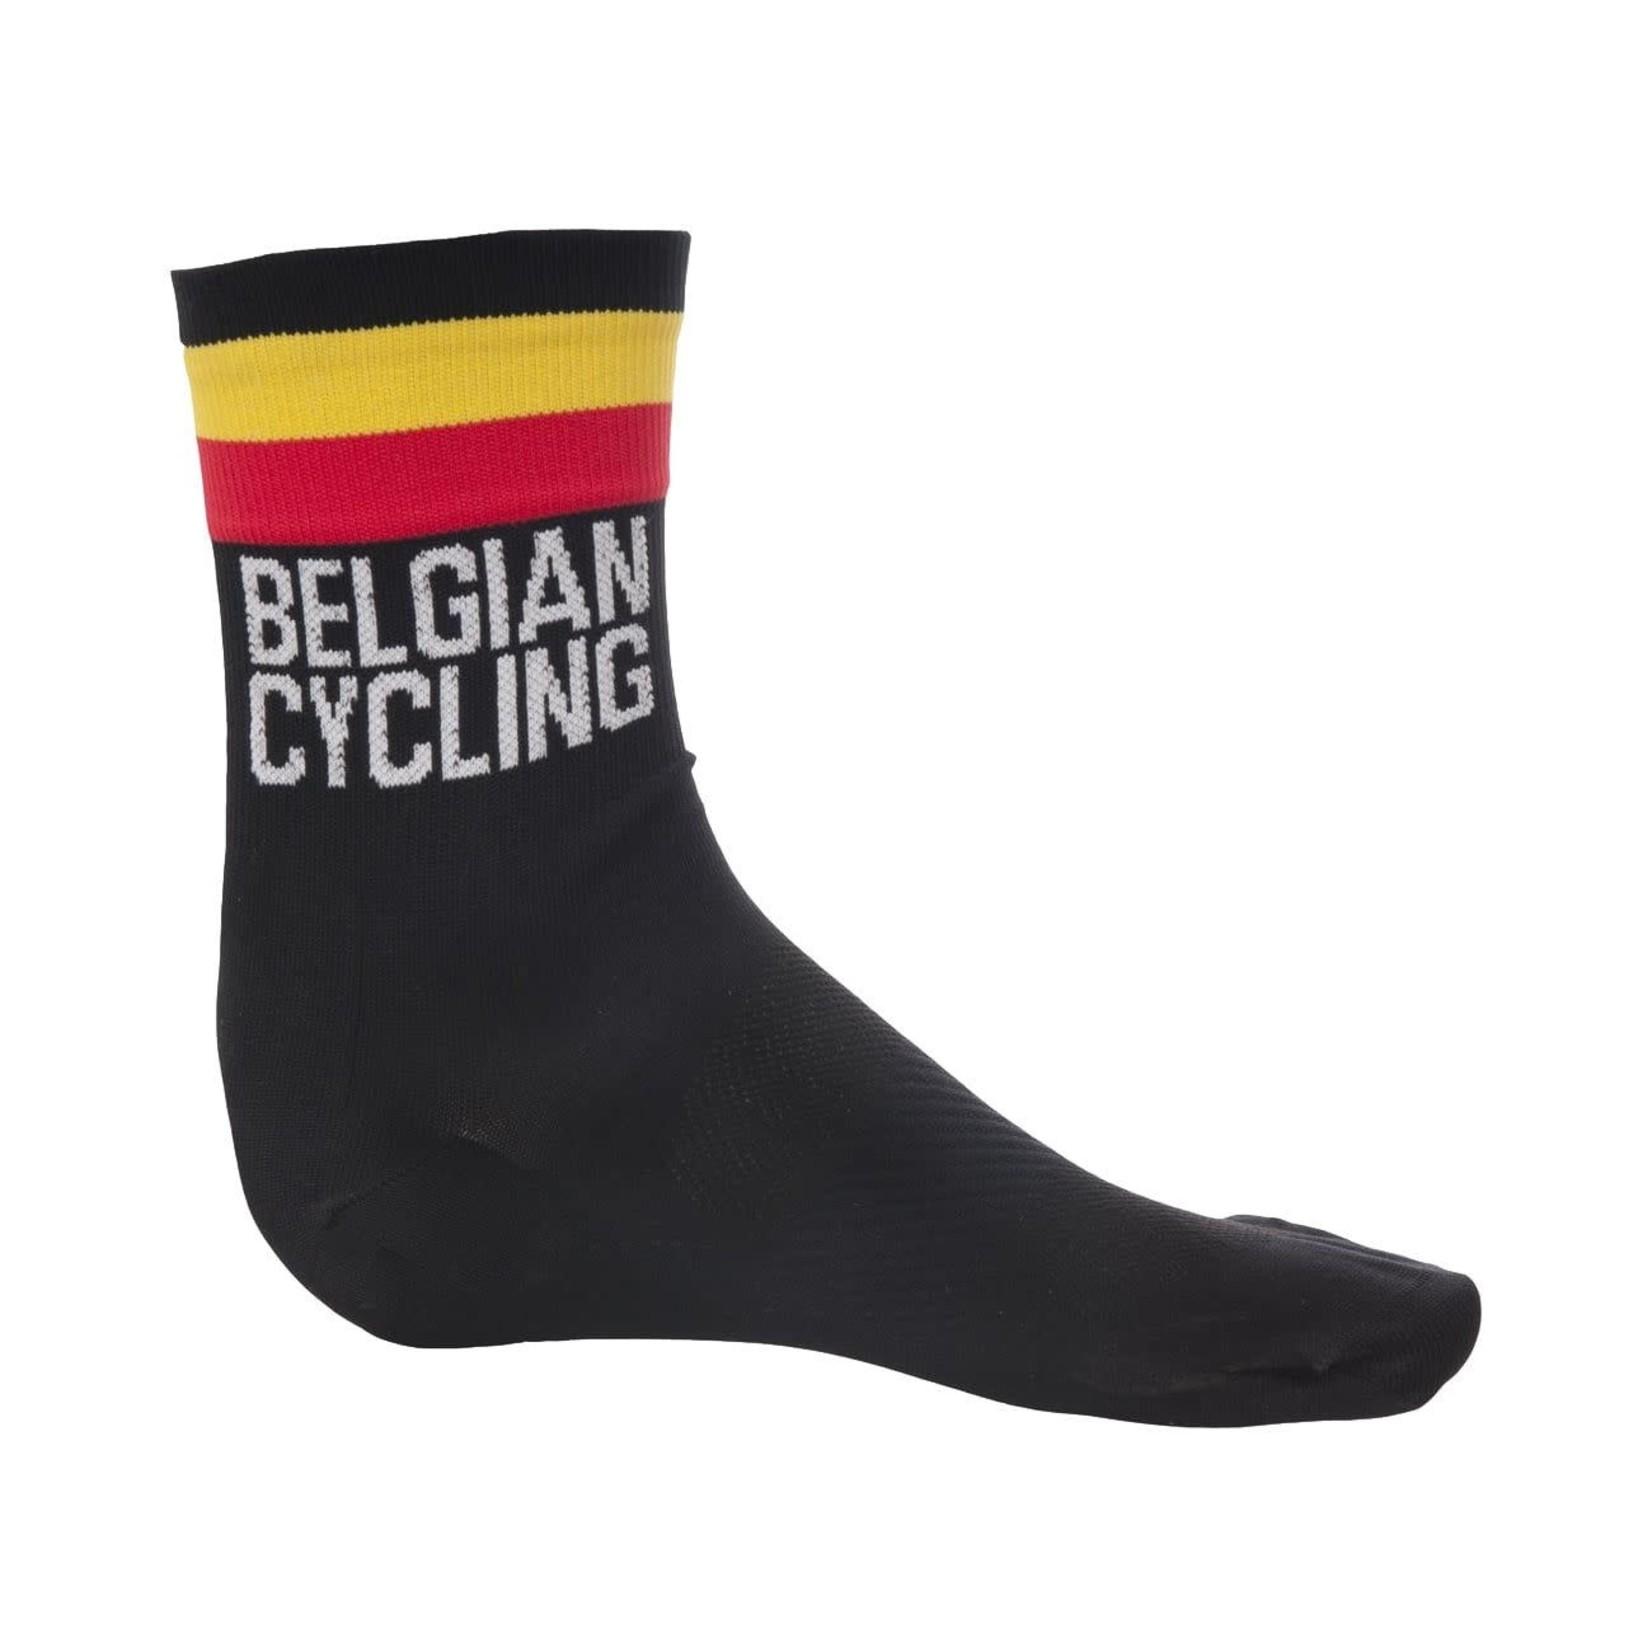 'Belgian Cycling' Team Socks Black